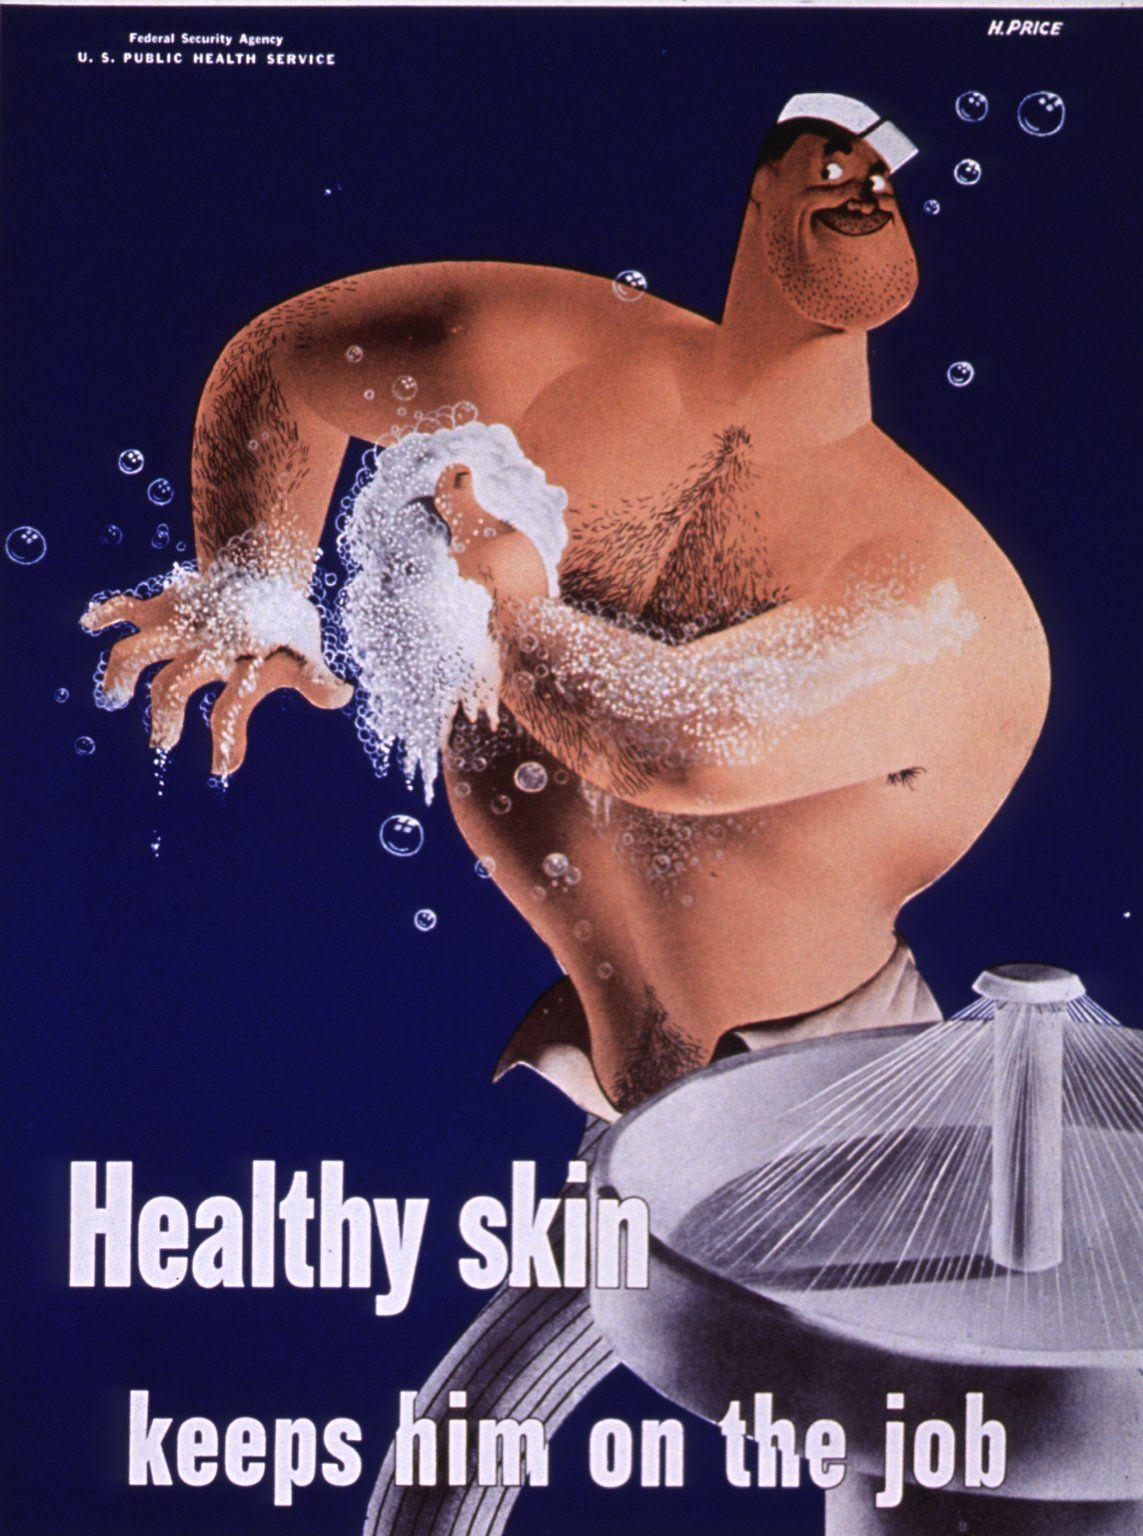 Personal hygiene campaign poster Art Pinterest